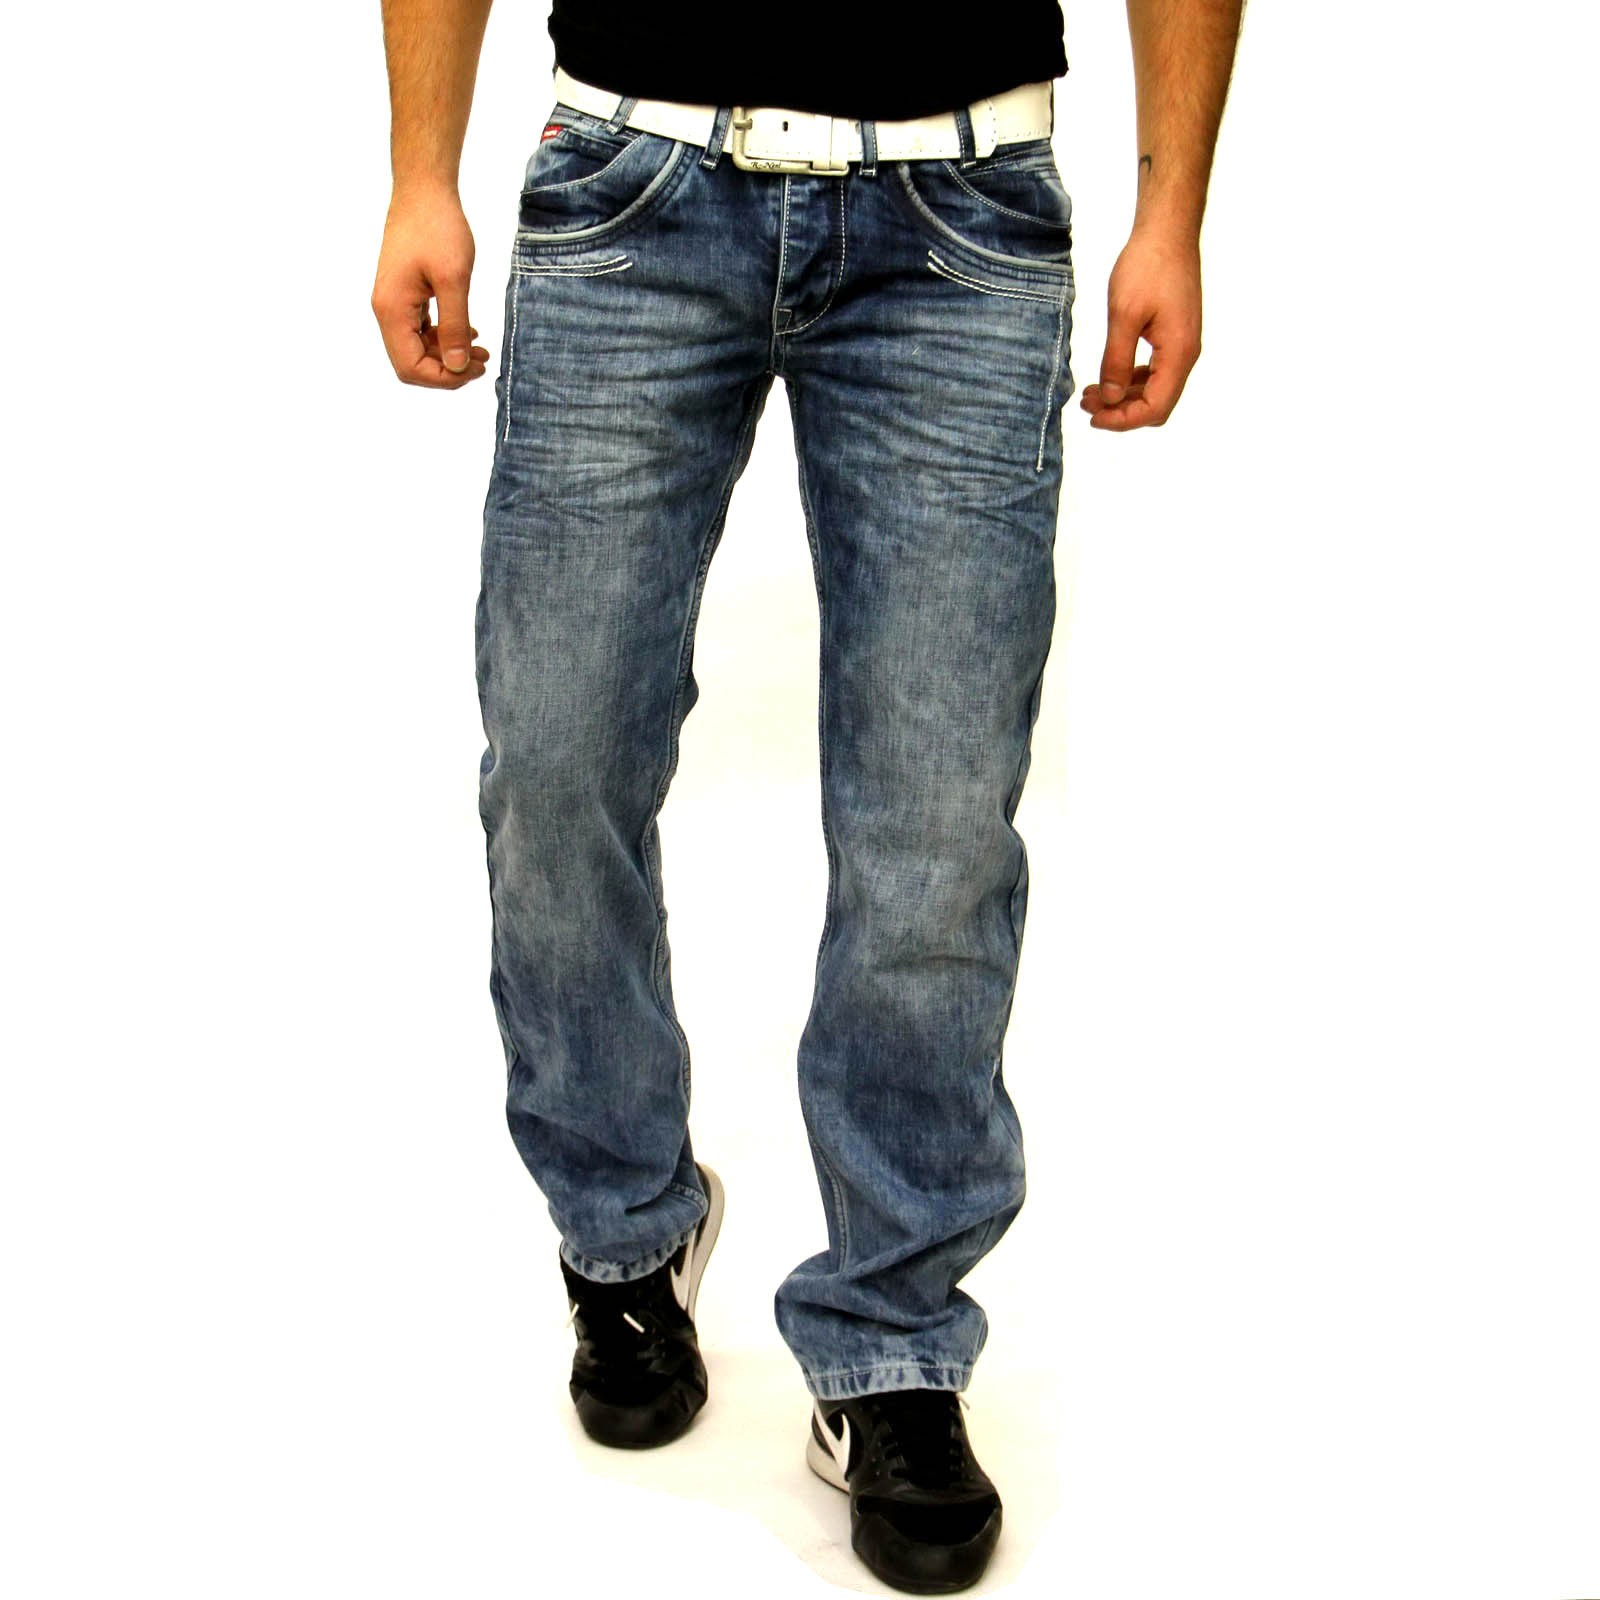 Herren Jeans Hose 7545 Rusty Neal